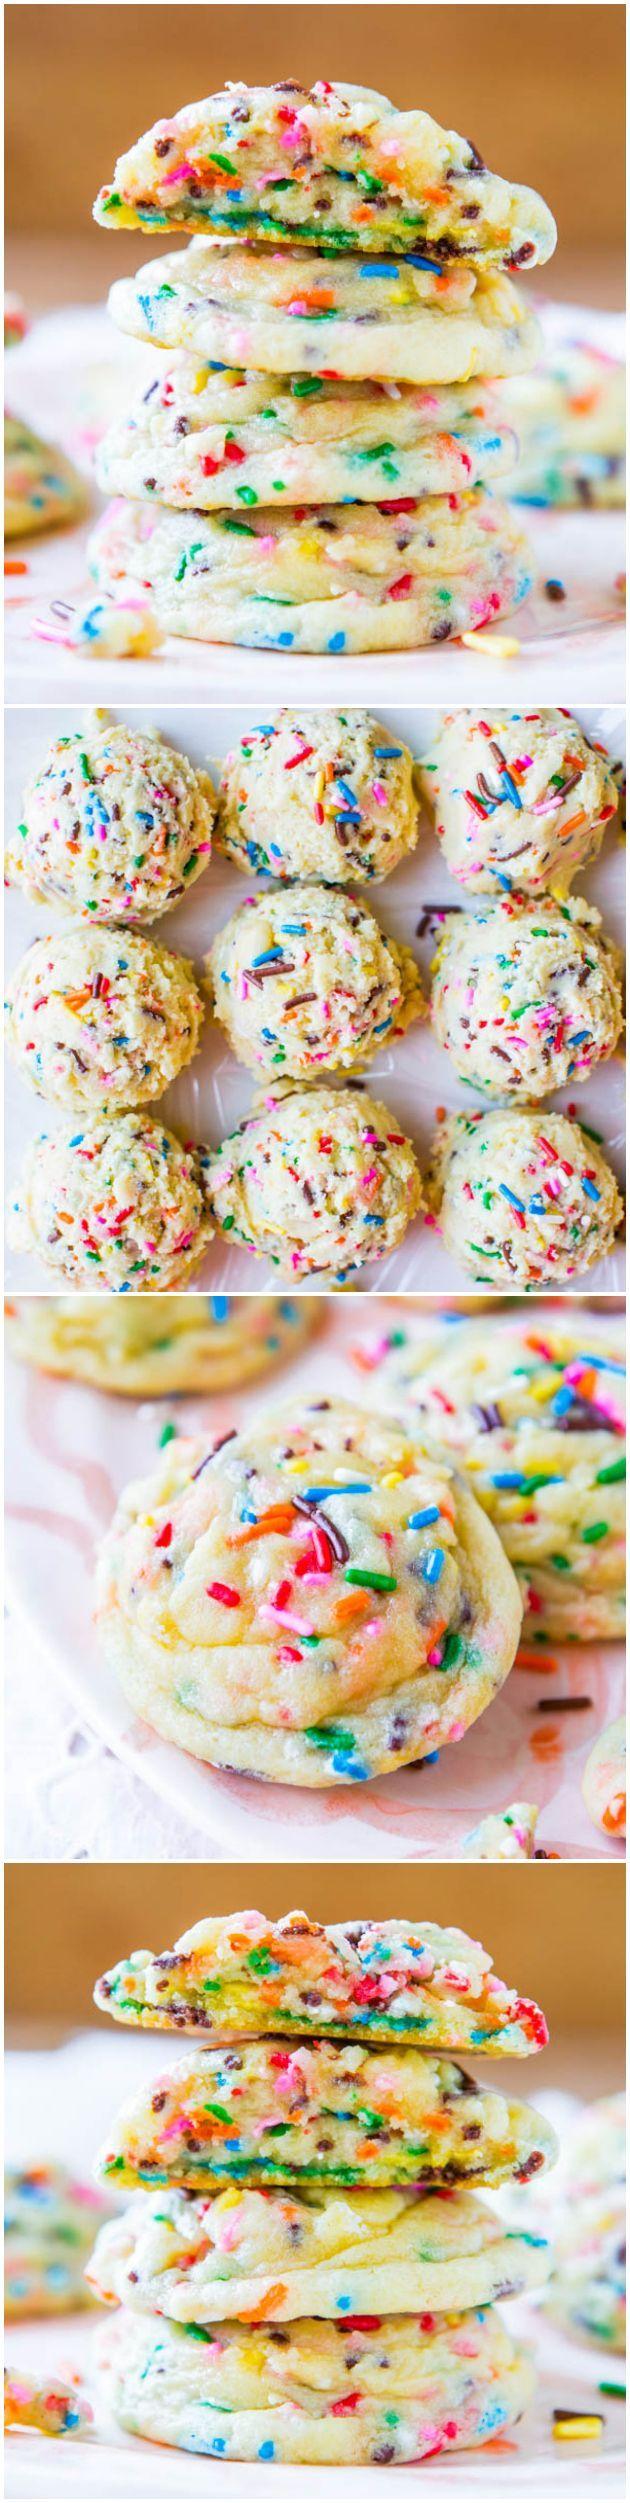 Softbatch Funfetti Sugar Cookies #treatyoself #cookies